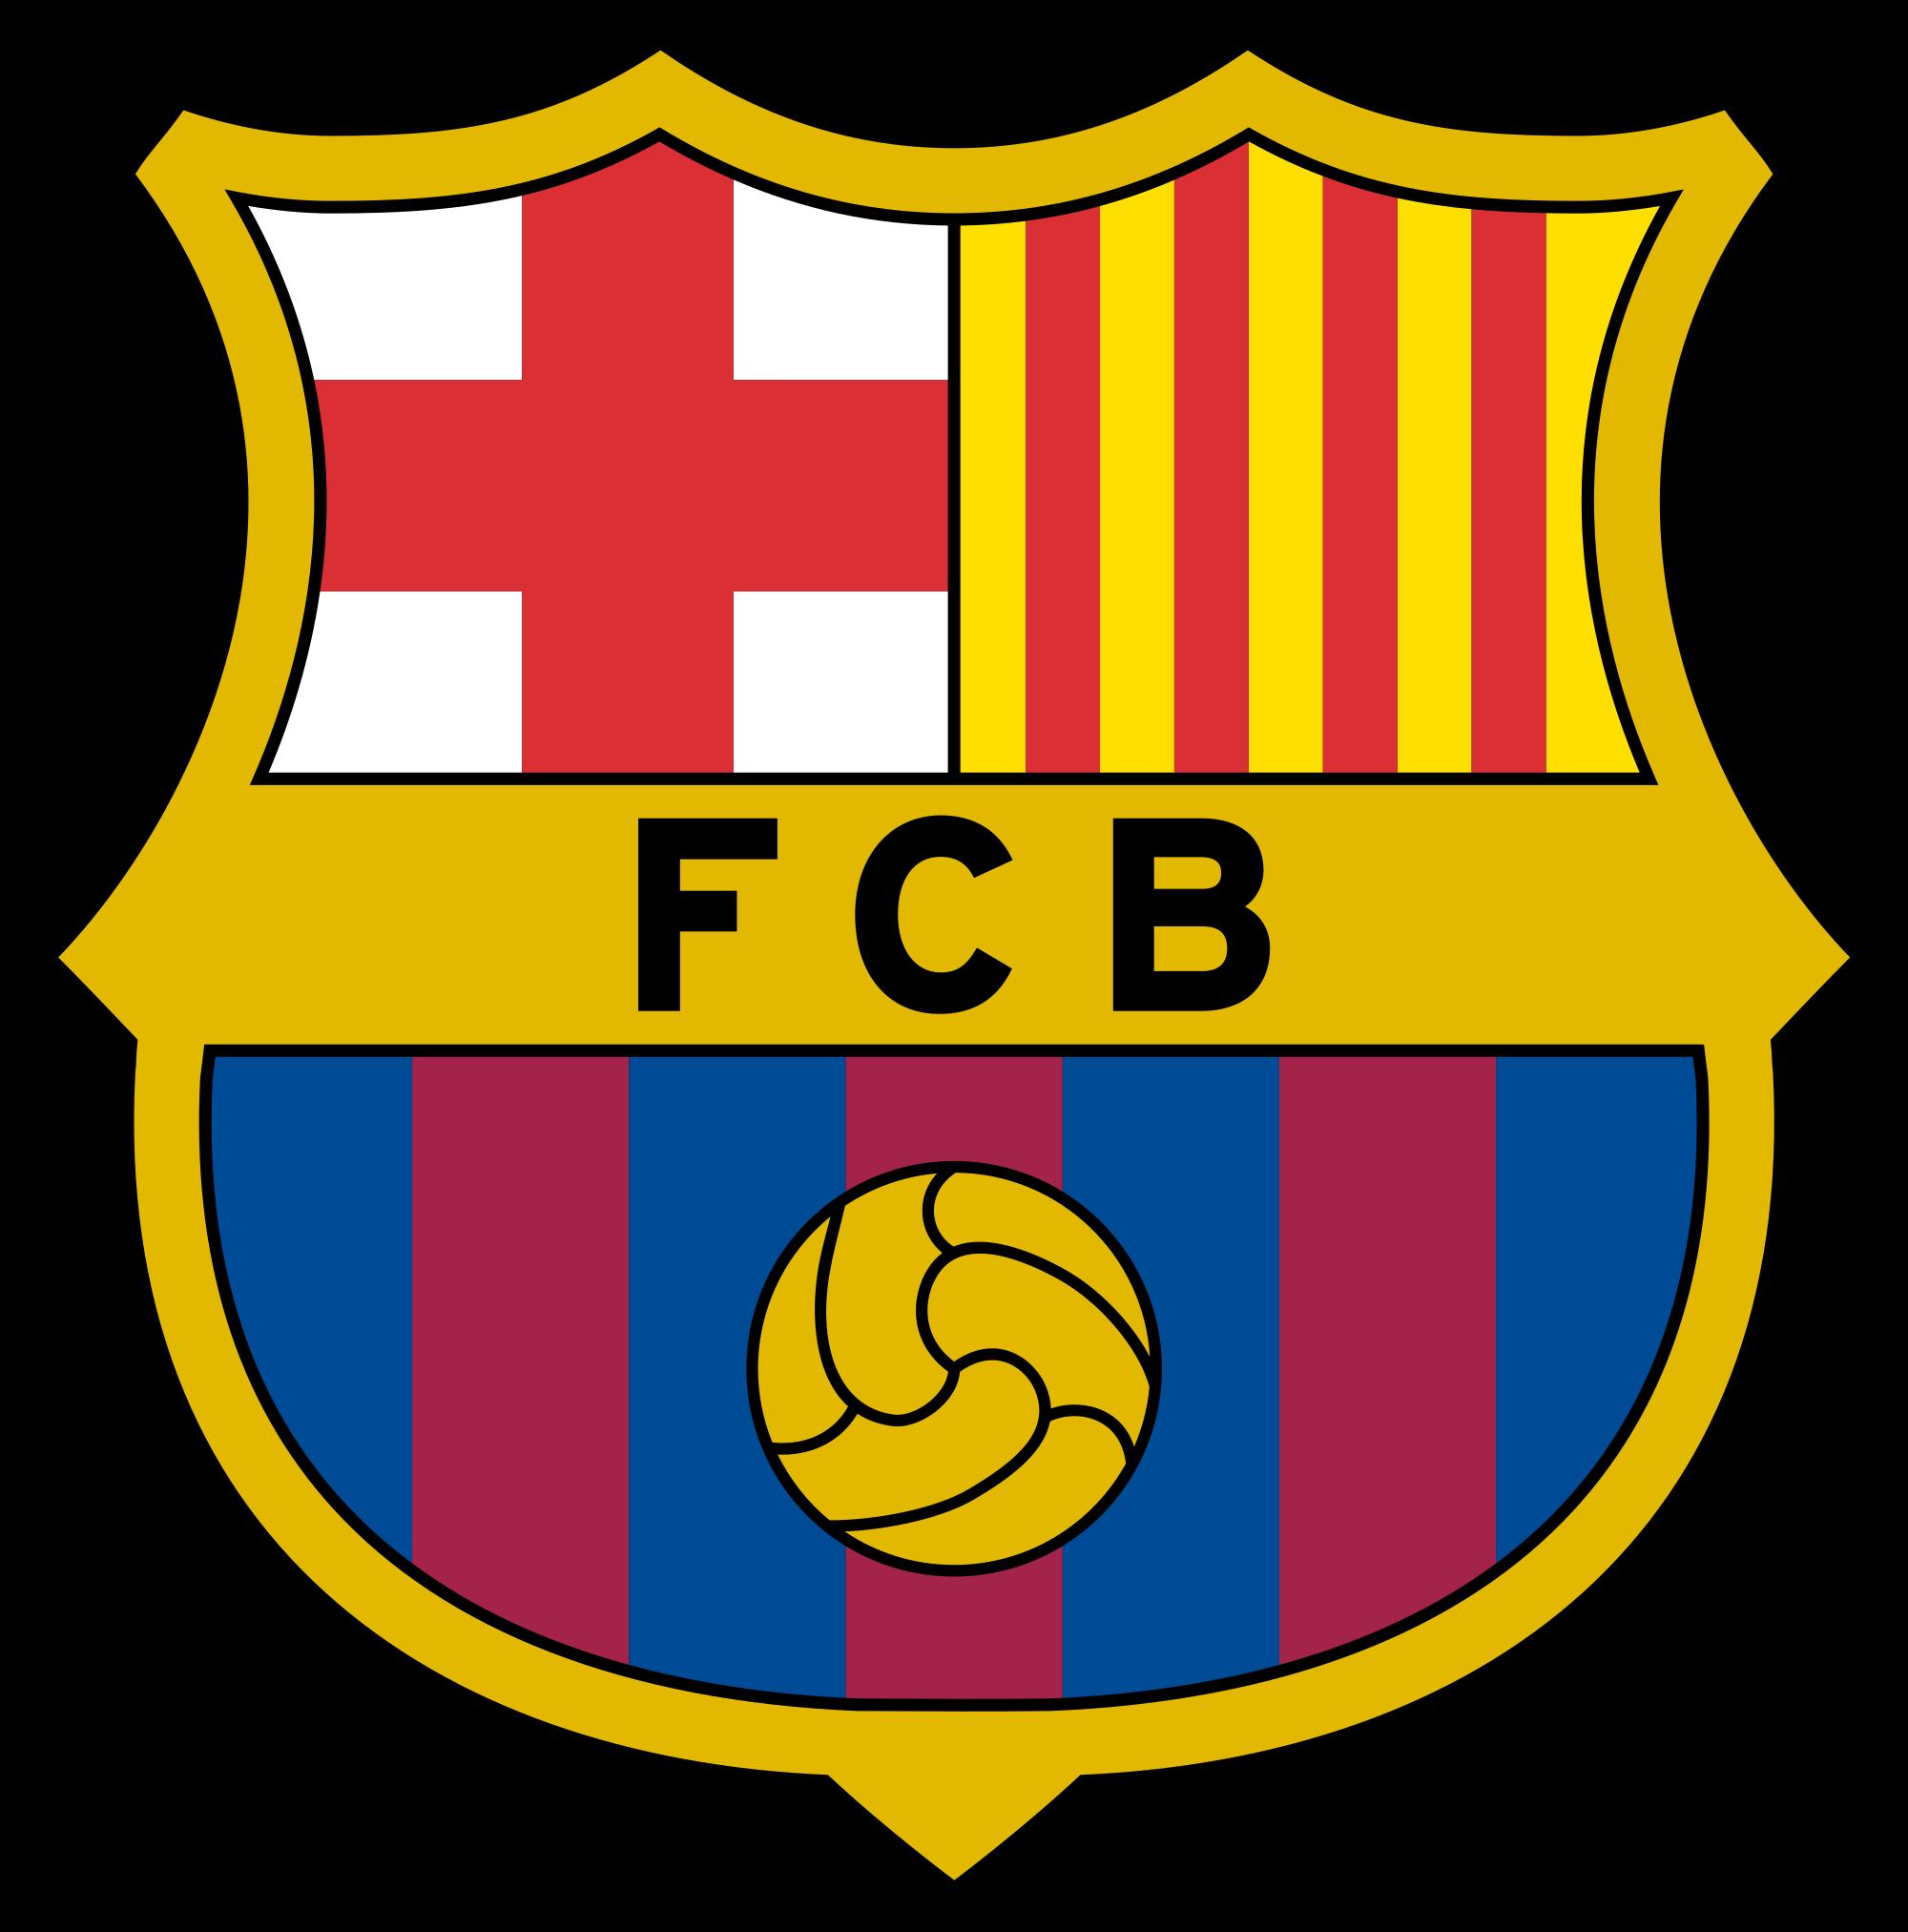 Fc Barcelona Fussball Gr 5 Rot Blau Fc Barcelona Primera Division Fussball Vertriebsarena Gmbh Ihr Sportartikel Handler Portal